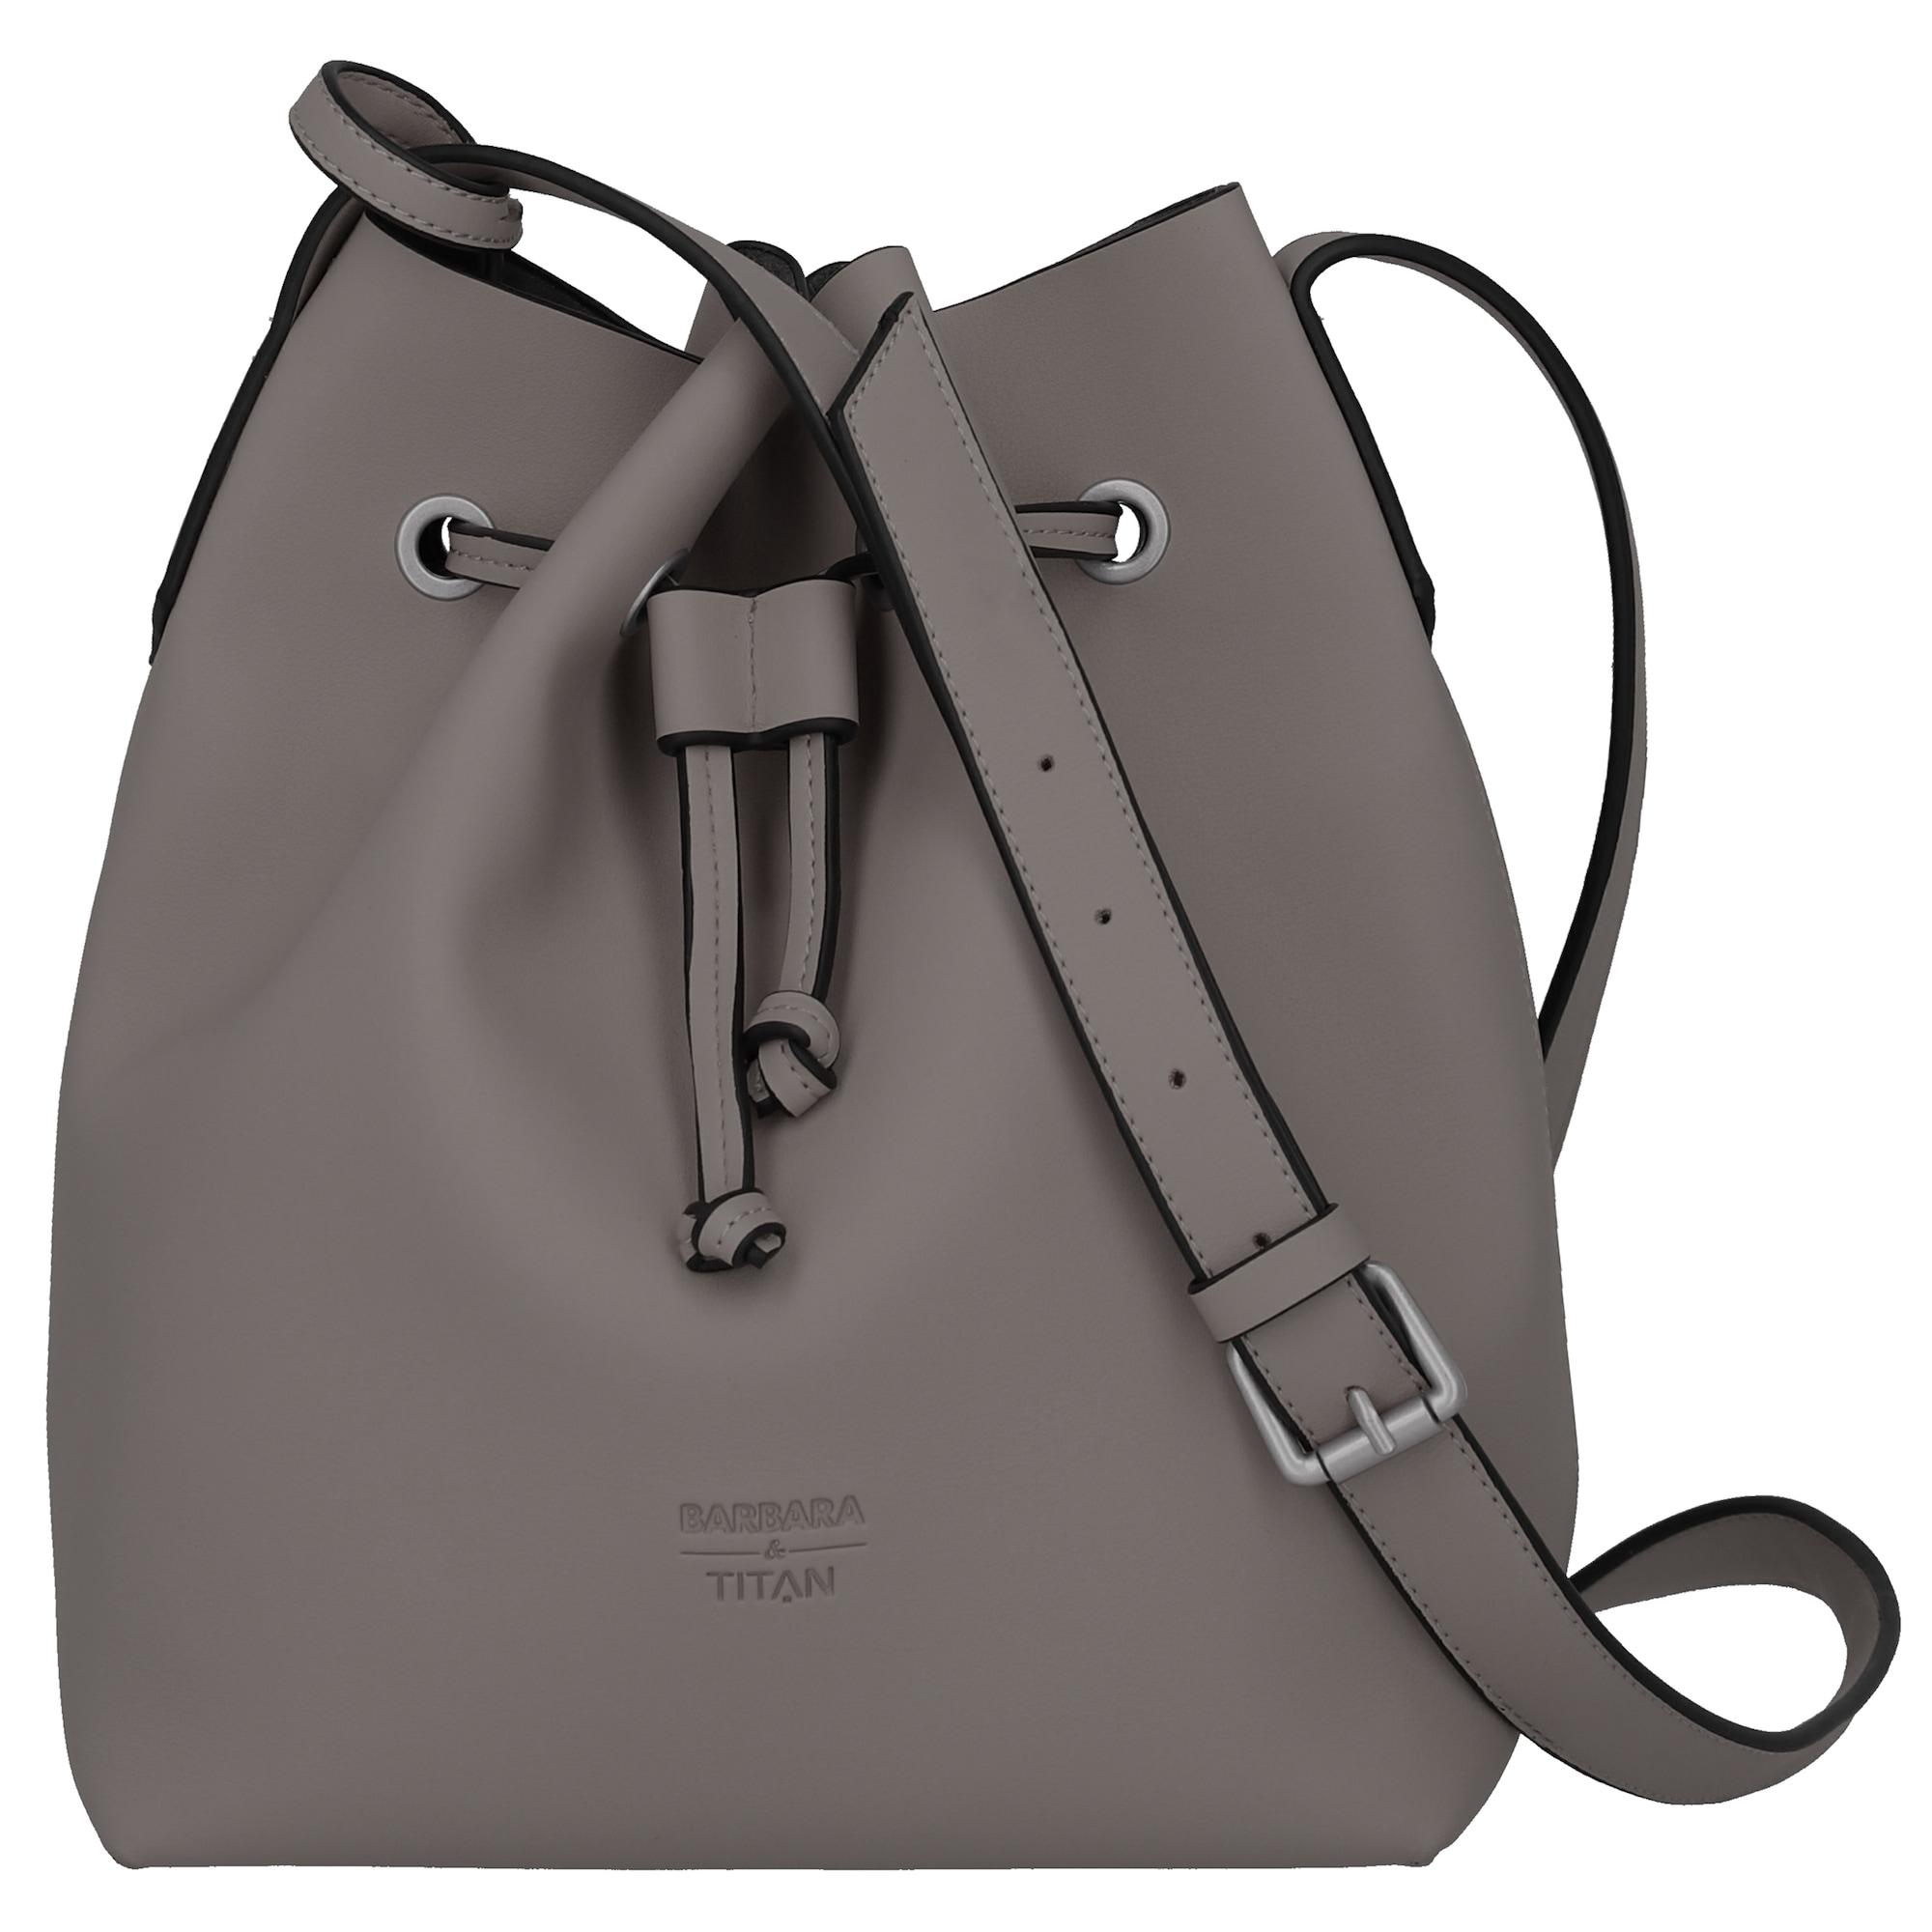 Beuteltasche | Taschen > Handtaschen > Beuteltaschen | Titan